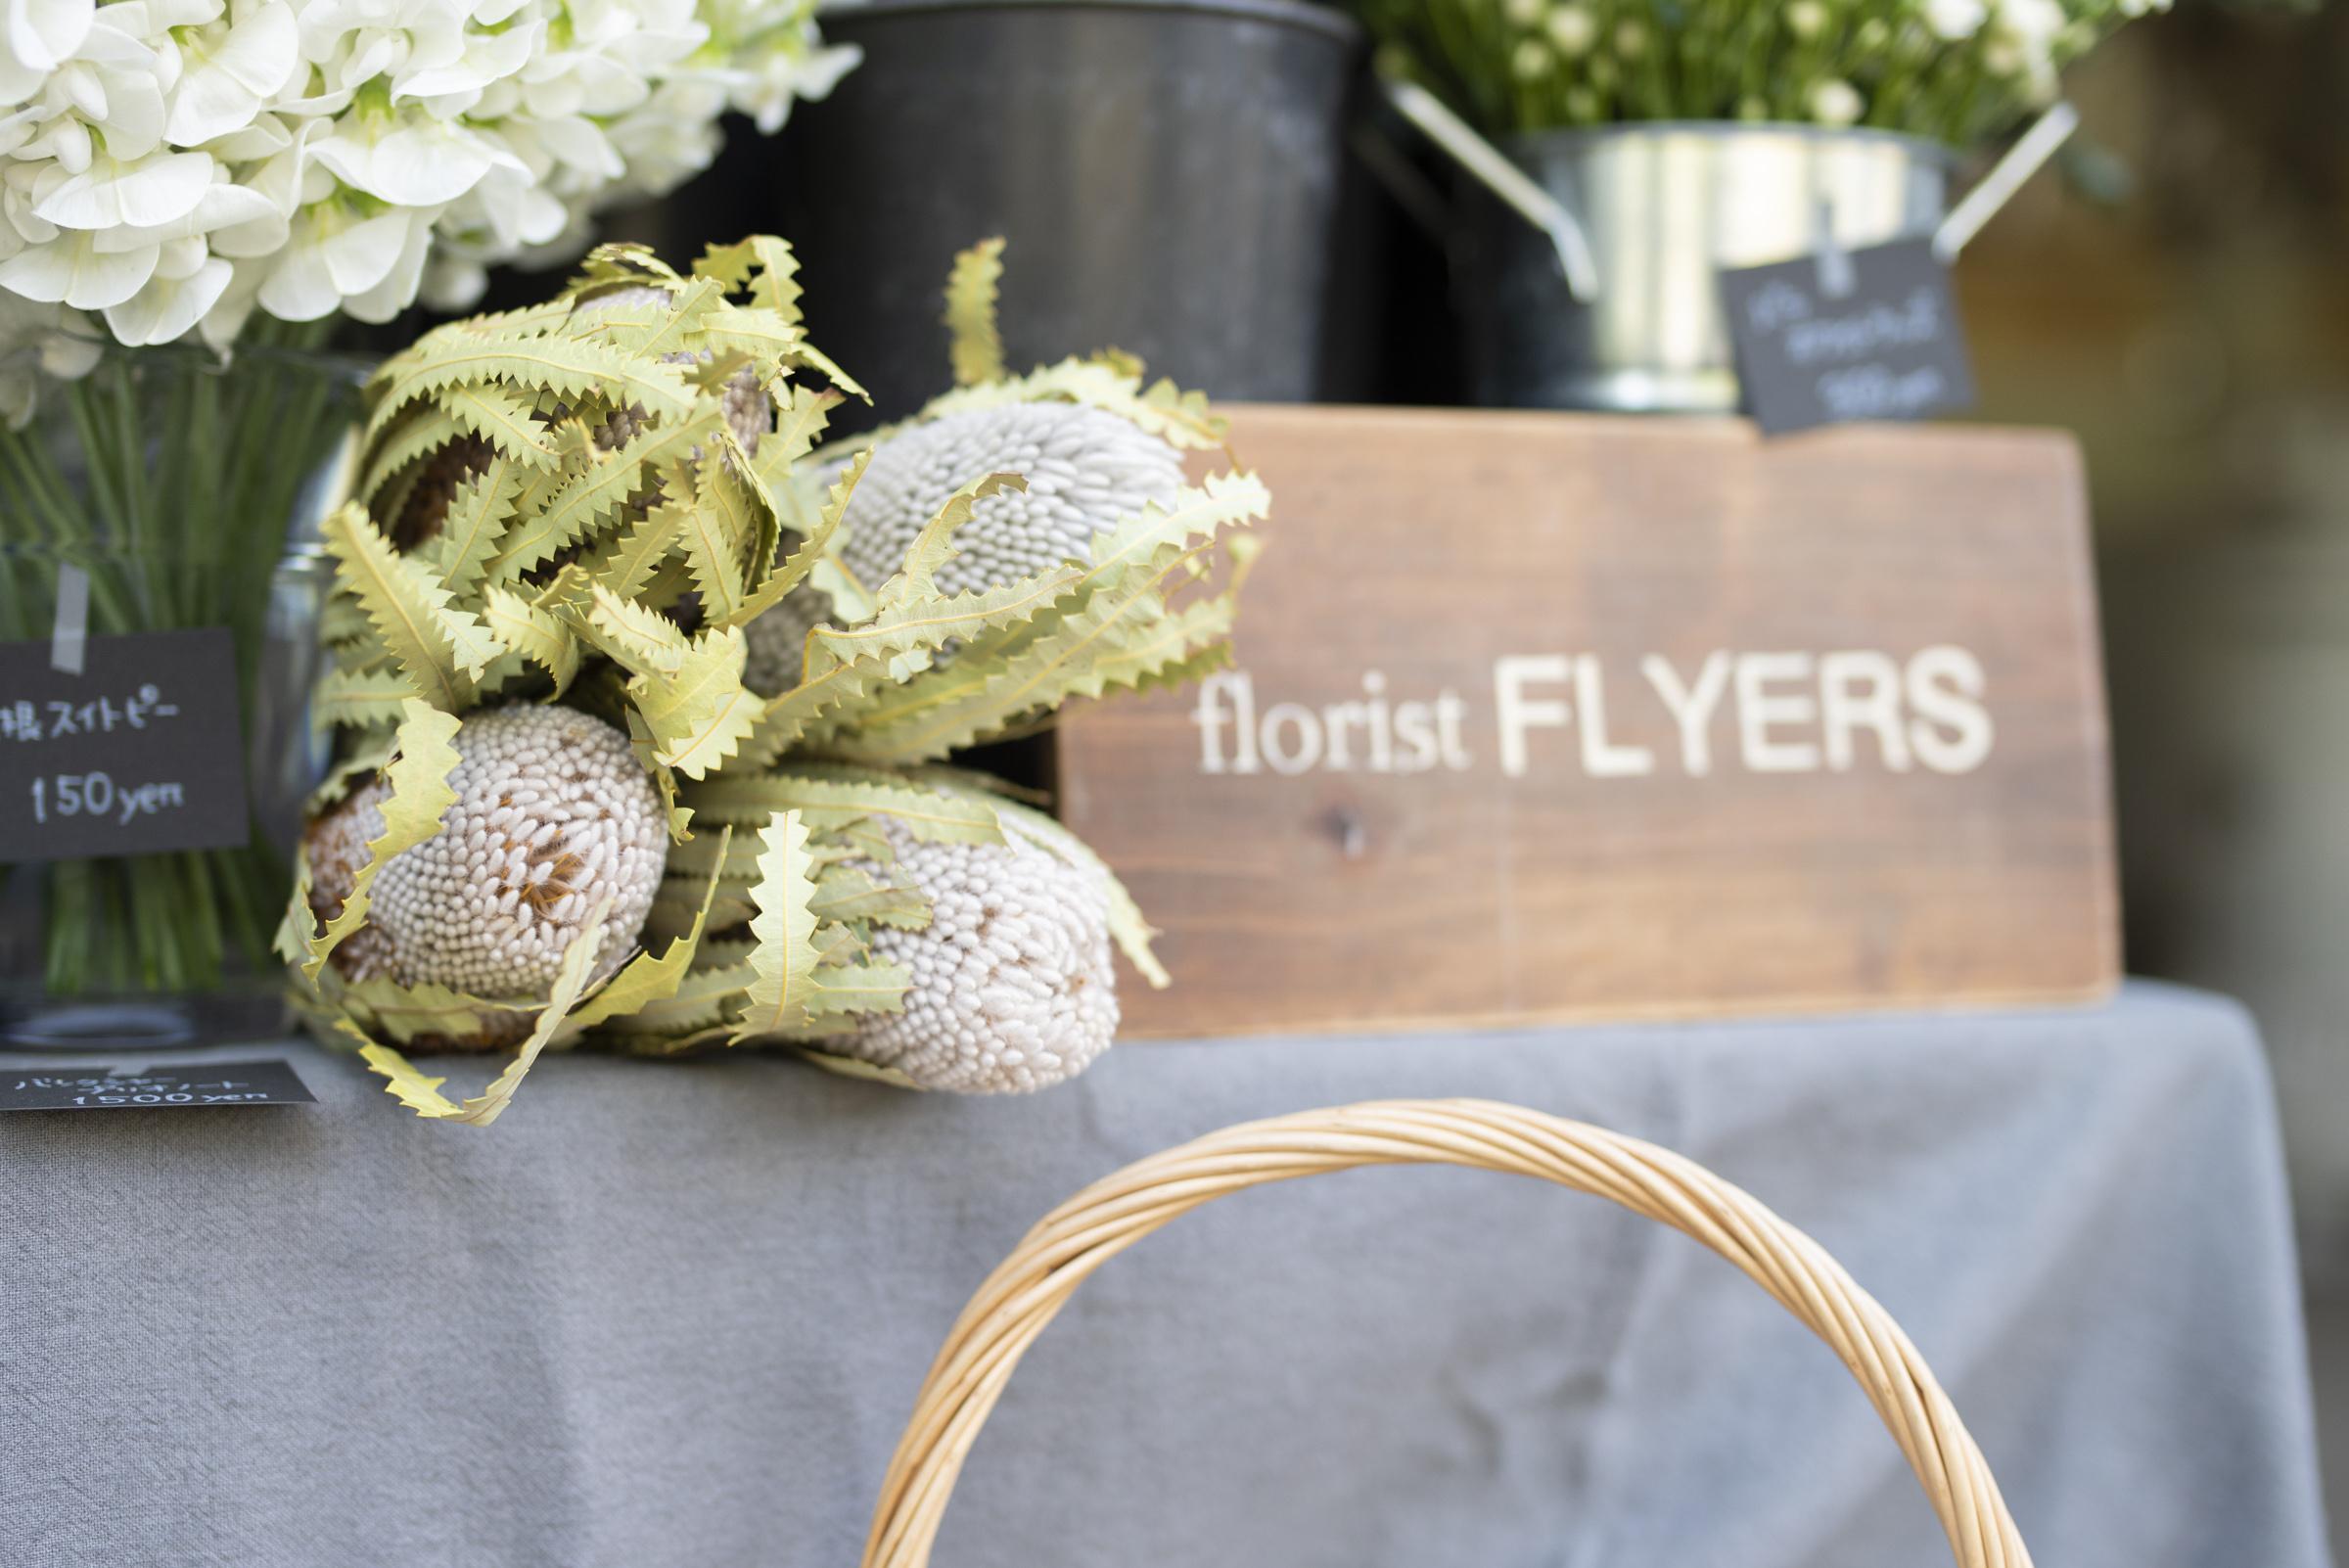 09_florist_fryers